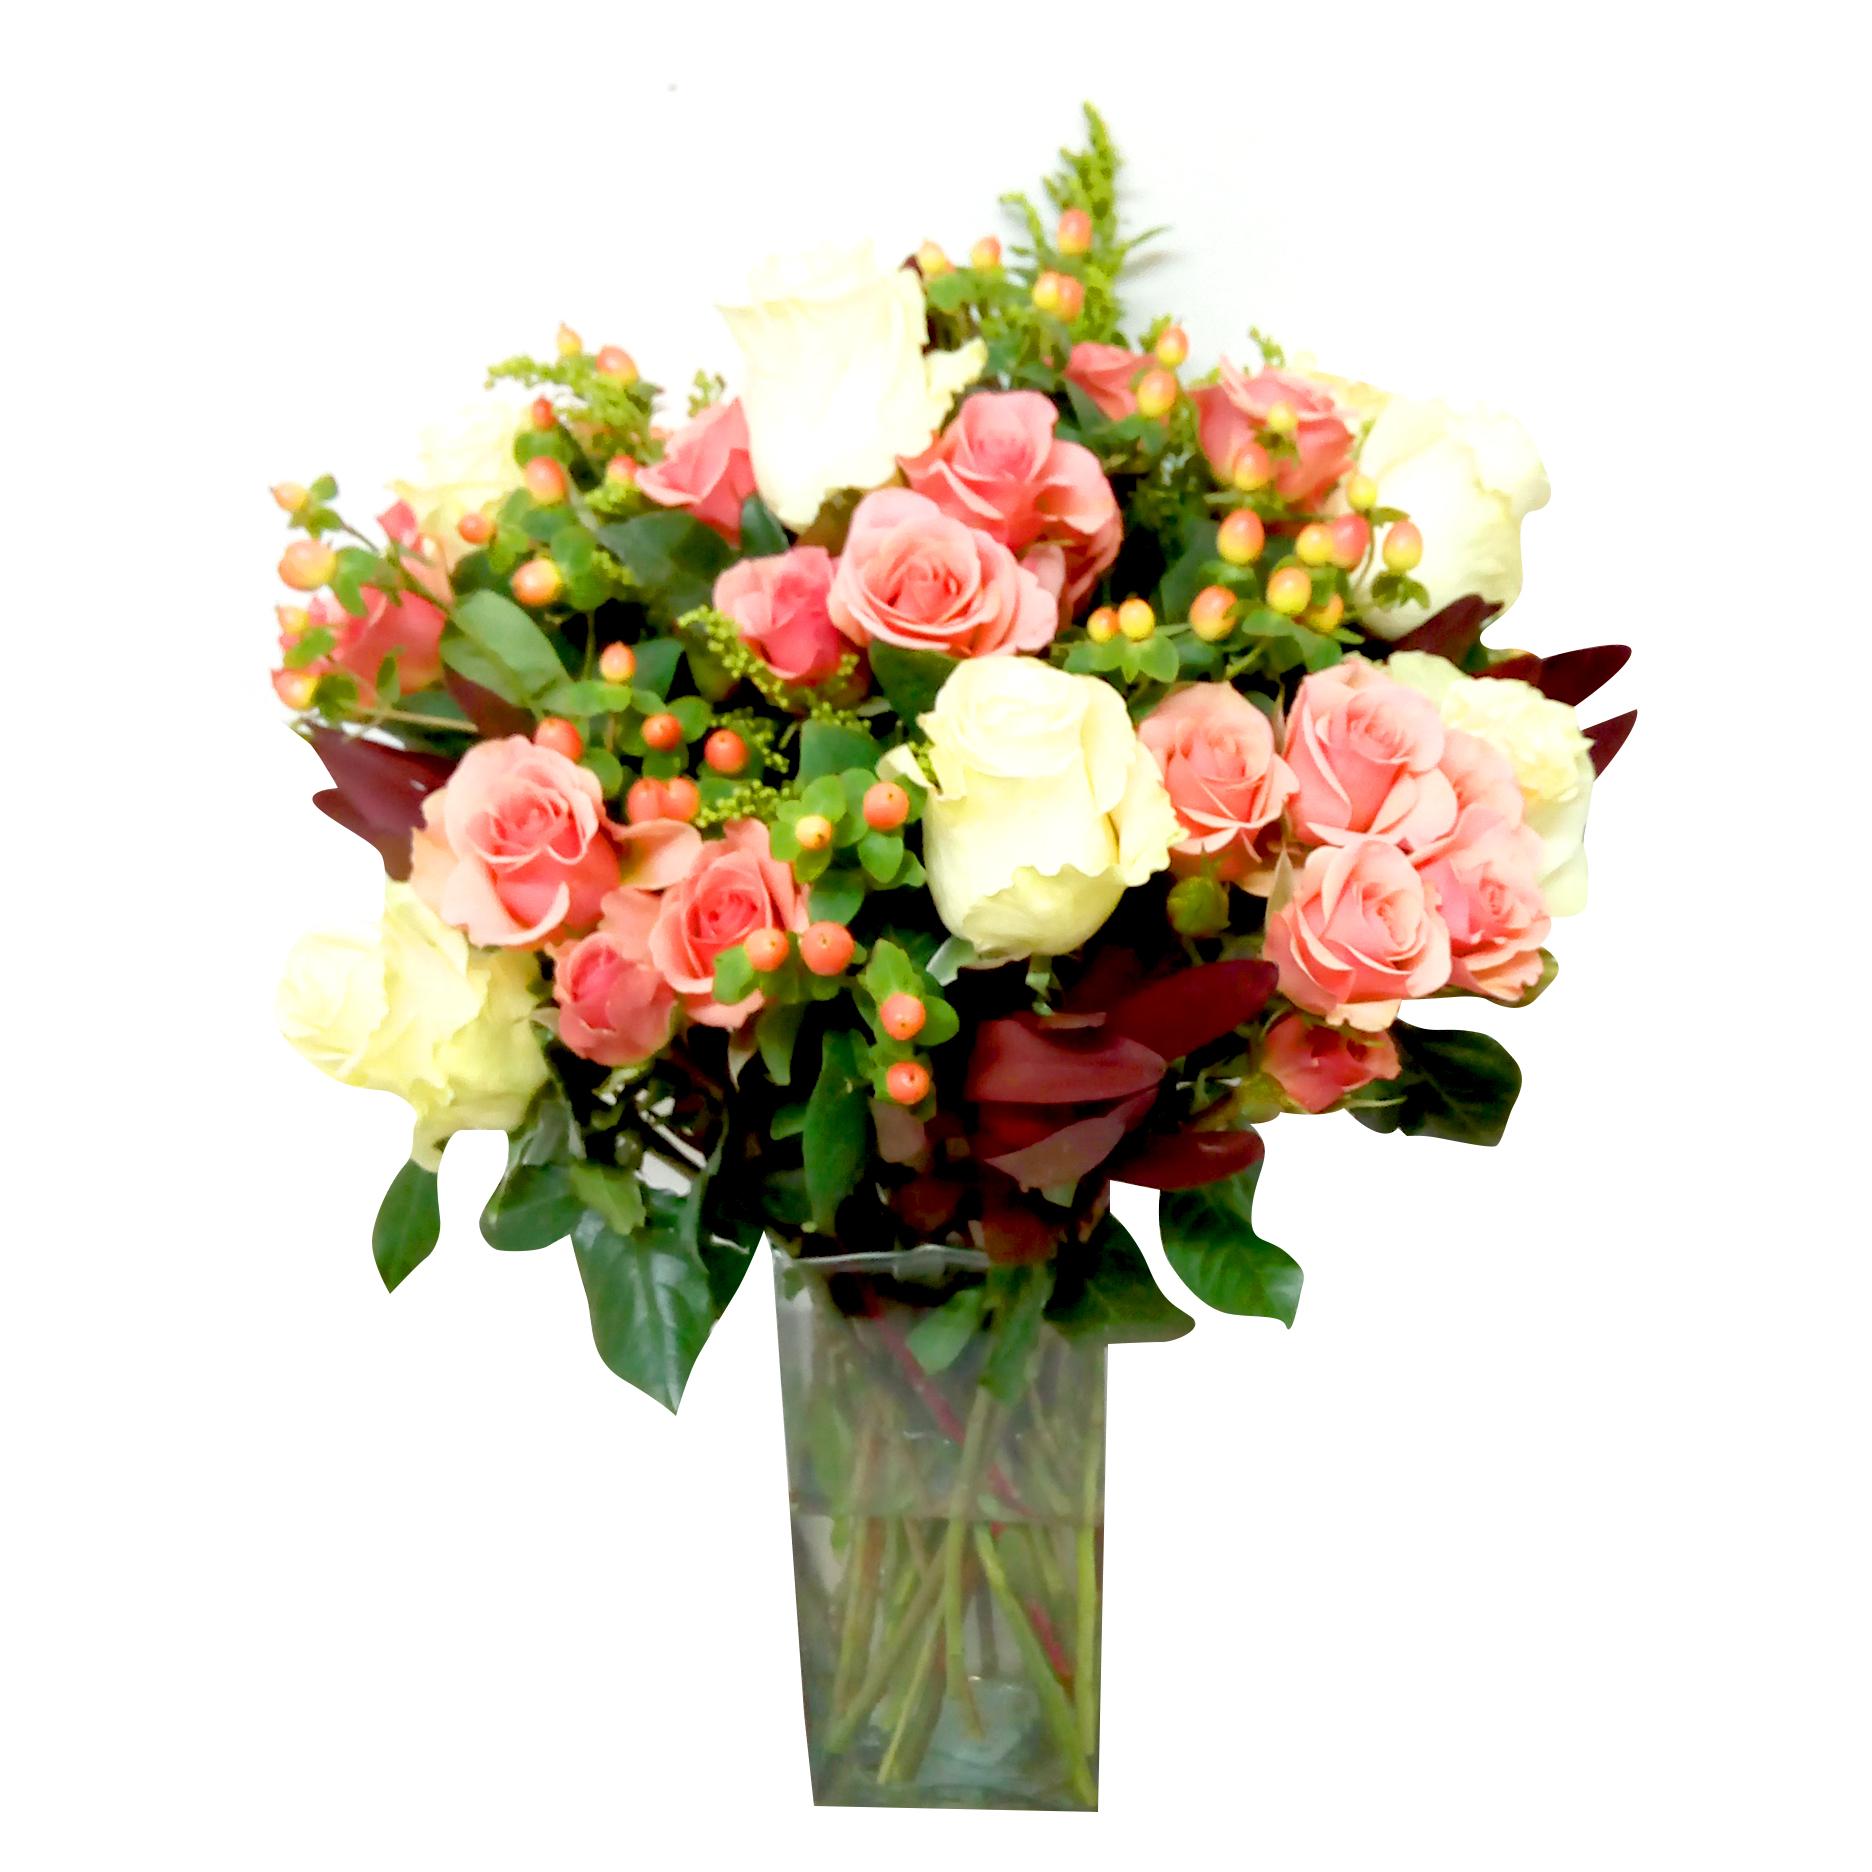 Florero Mixto con Rosas, Mini Rosas, Hypericum y Proteas